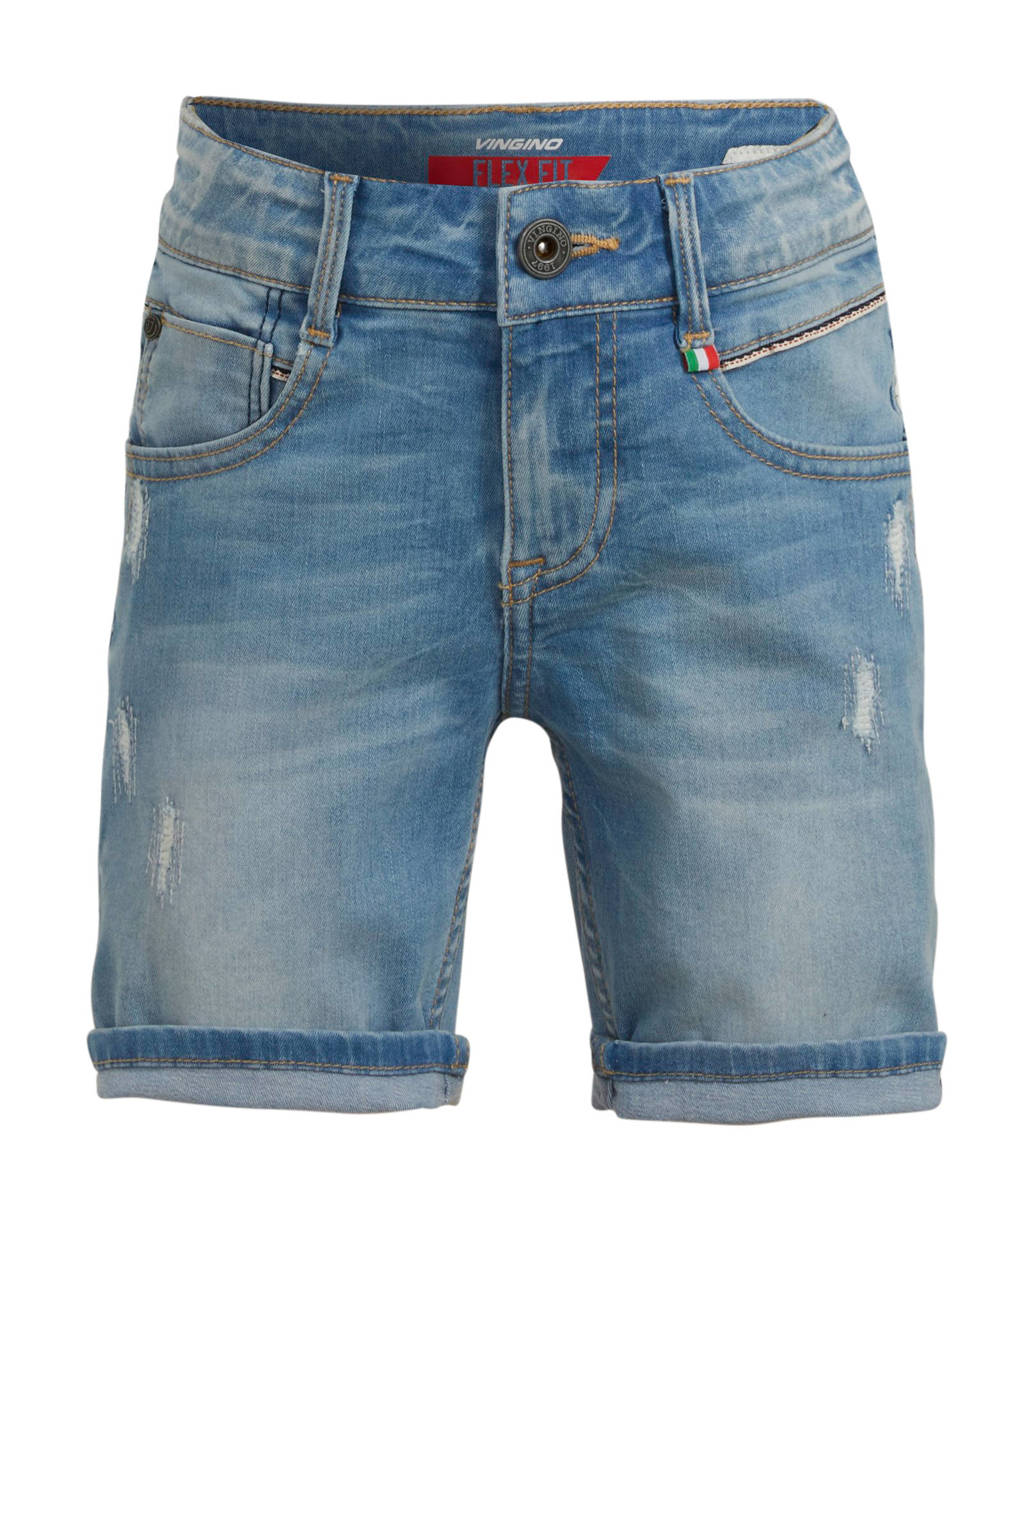 Vingino jeans bermuda Caluigi light vintage, Light vintage